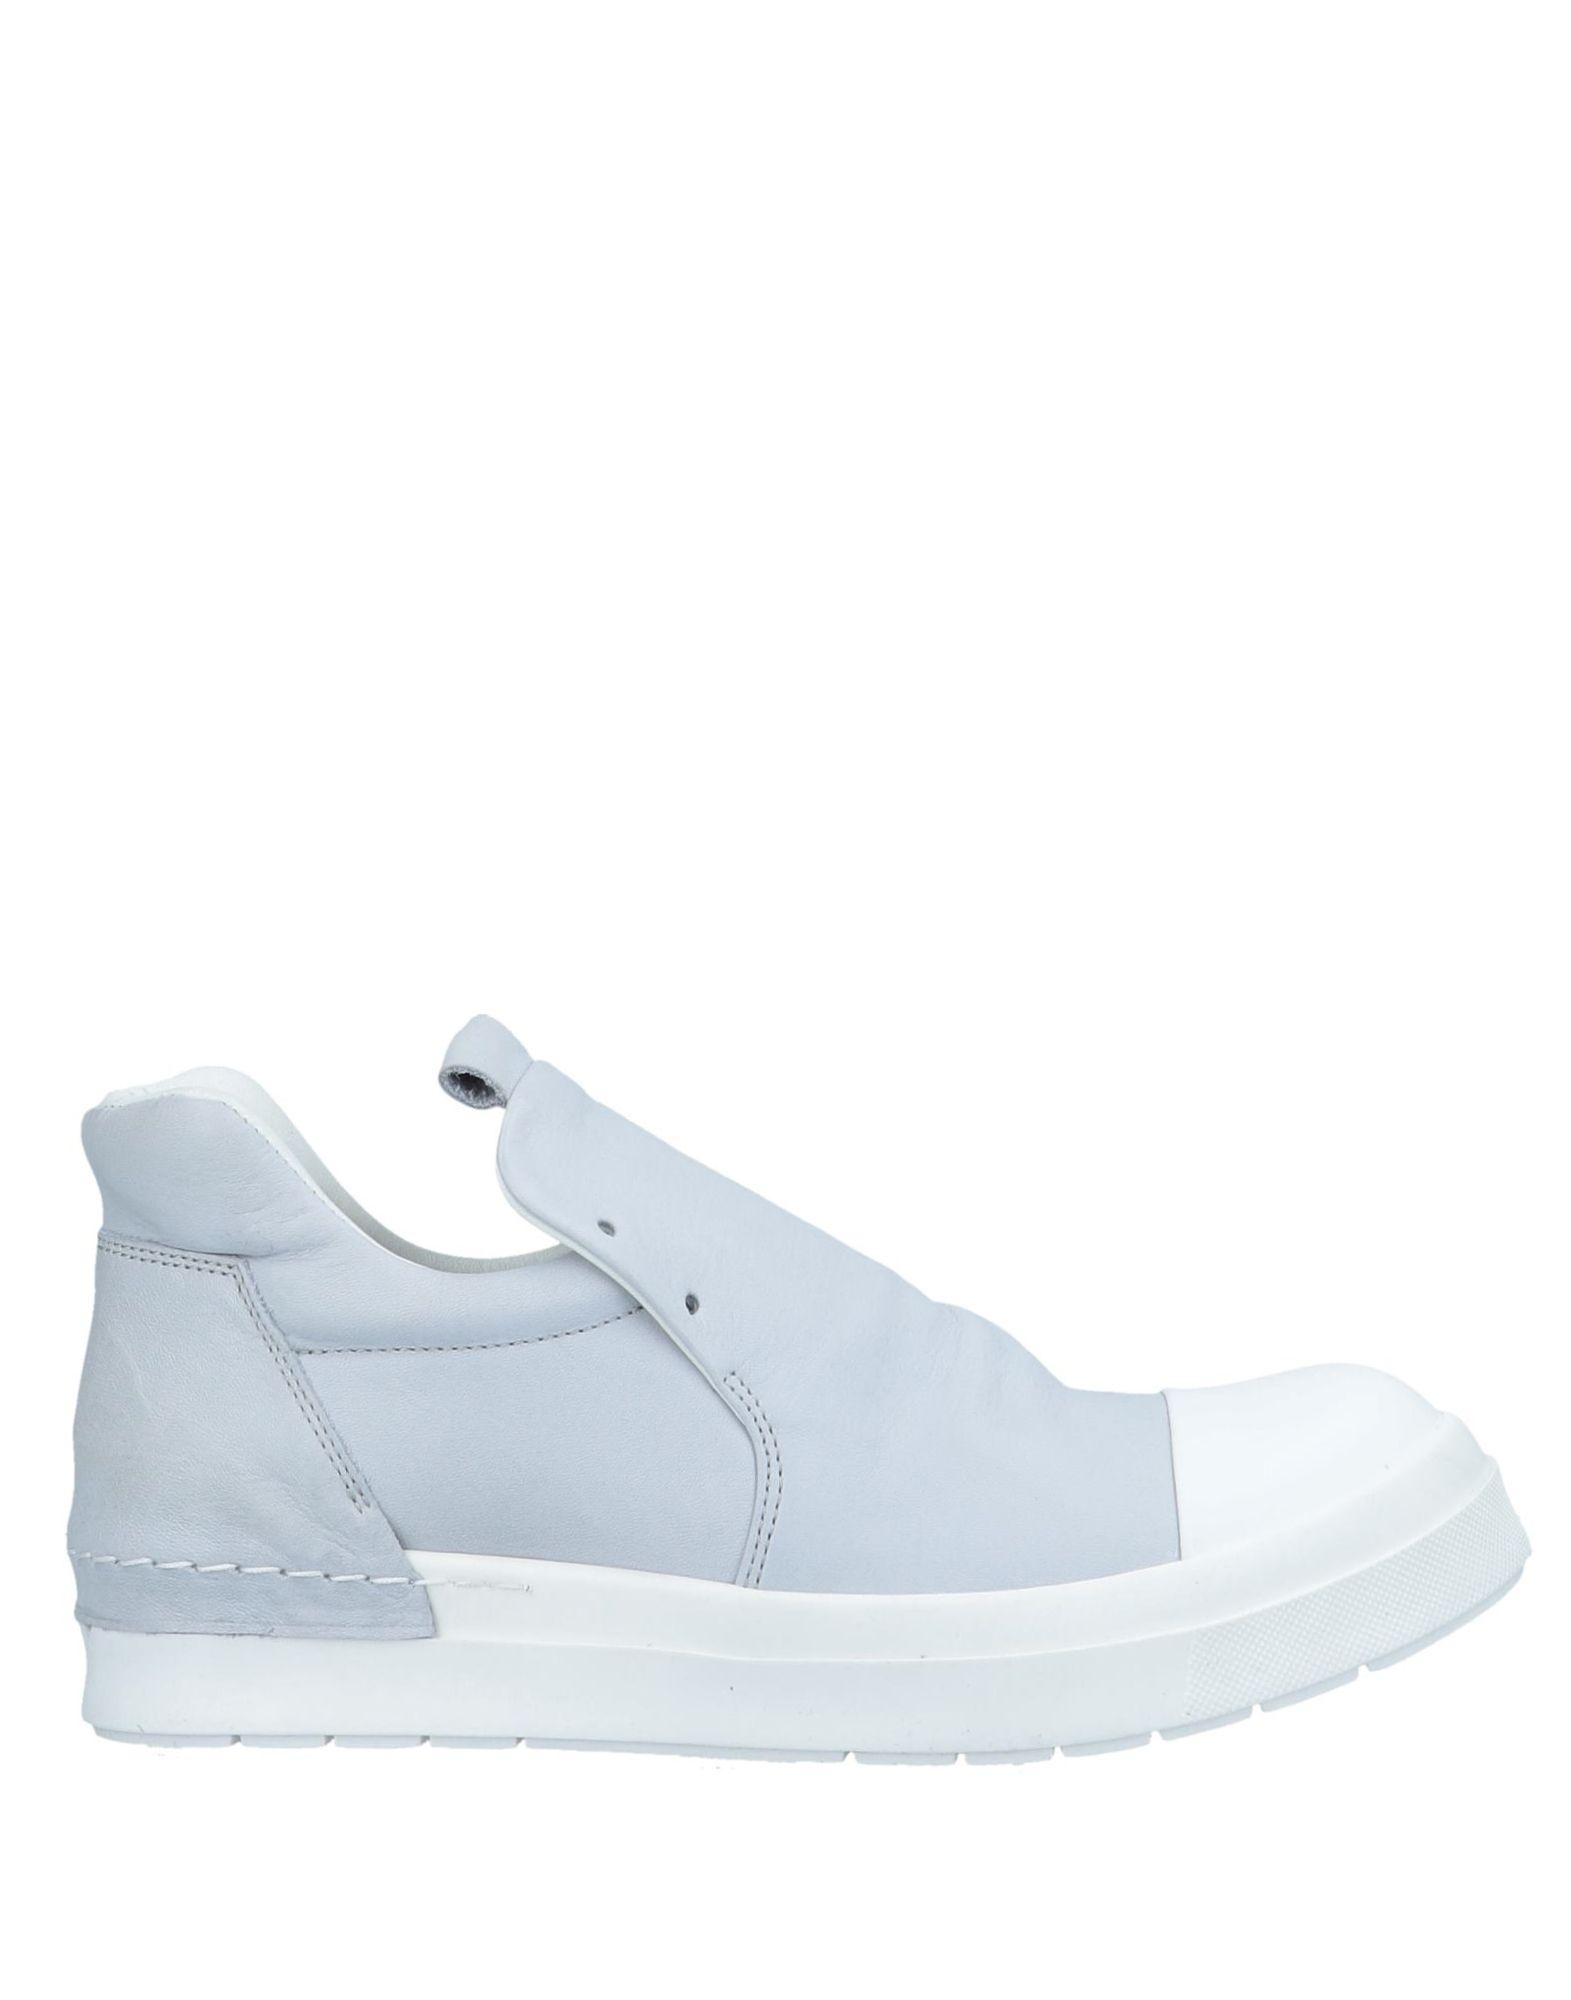 Cinzia Araia Sneakers - Men Cinzia Araia Sneakers online on 11573450VK  United Kingdom - 11573450VK on 5b5273